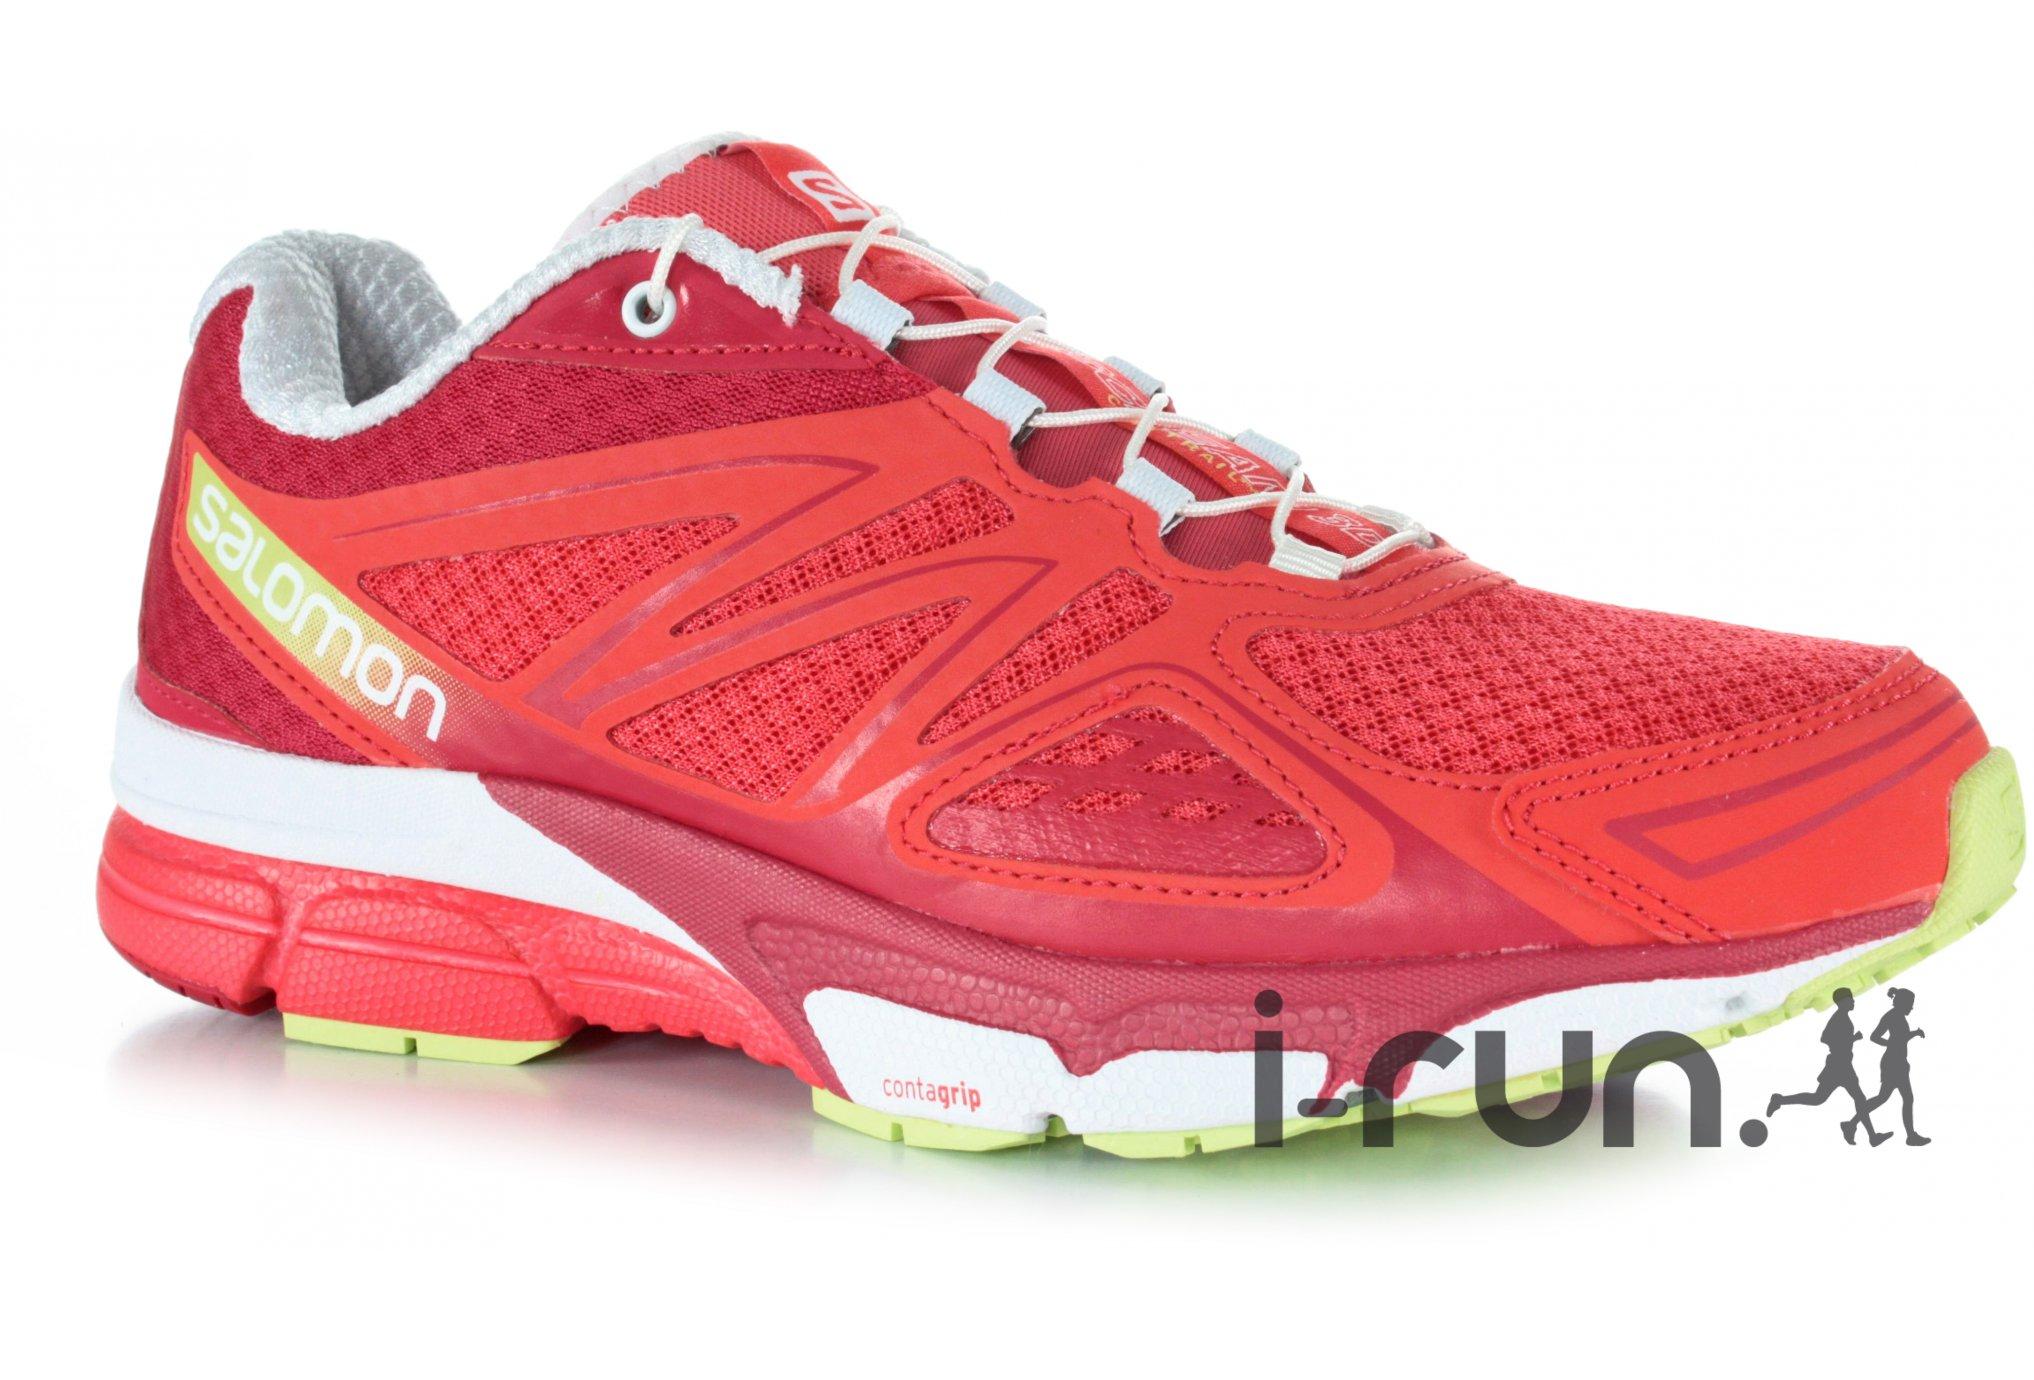 Salomon Sense Propulse Trail Running Shoes Review